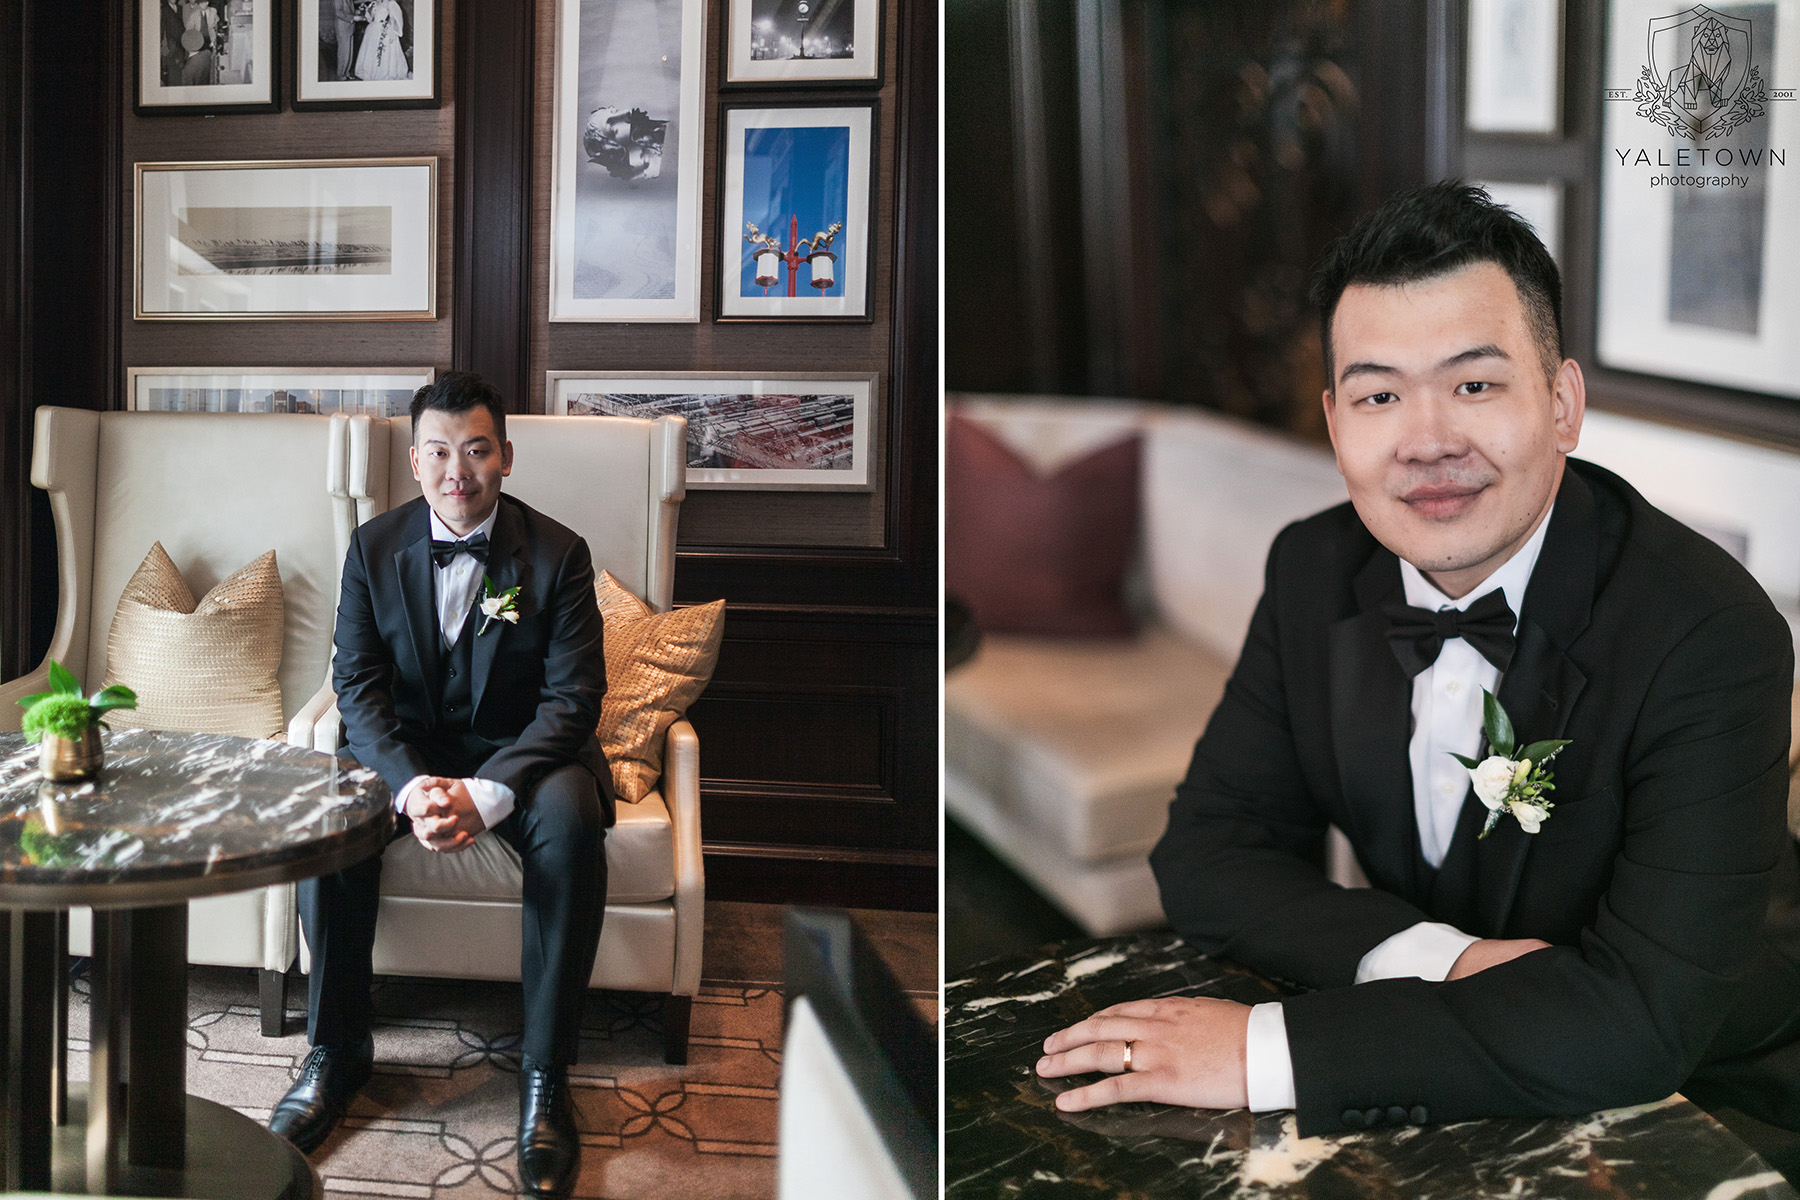 Groom-Portraits-Rosewood-Hotel-Georgia-Vancouver-Wedding-Yaletown-Photography-photo